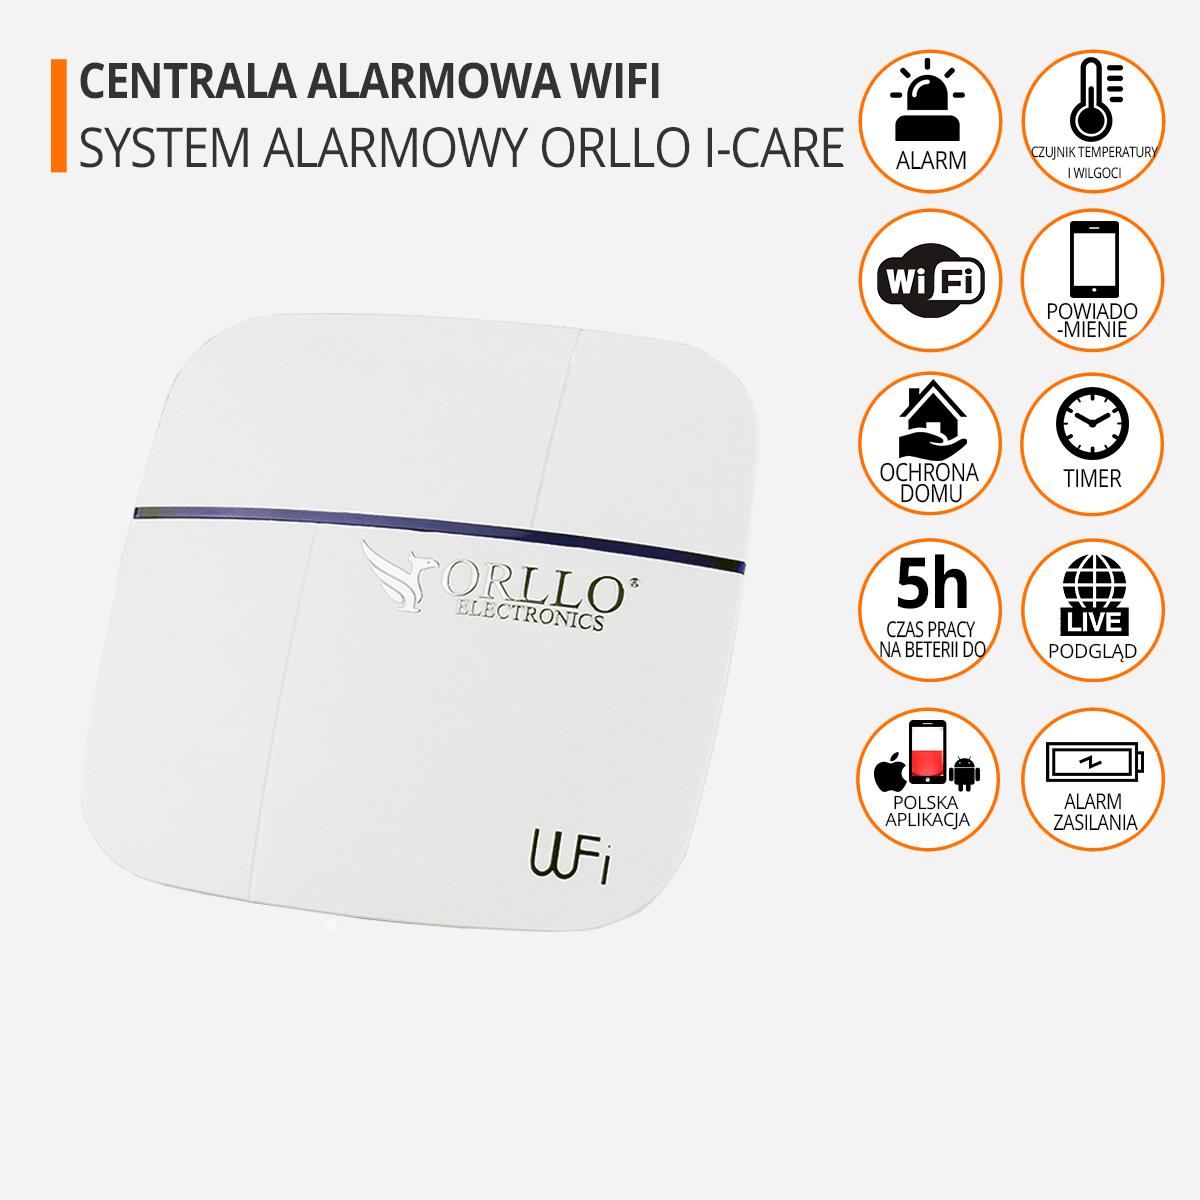 centrala alarmowa wifi funkcje orllo.pl